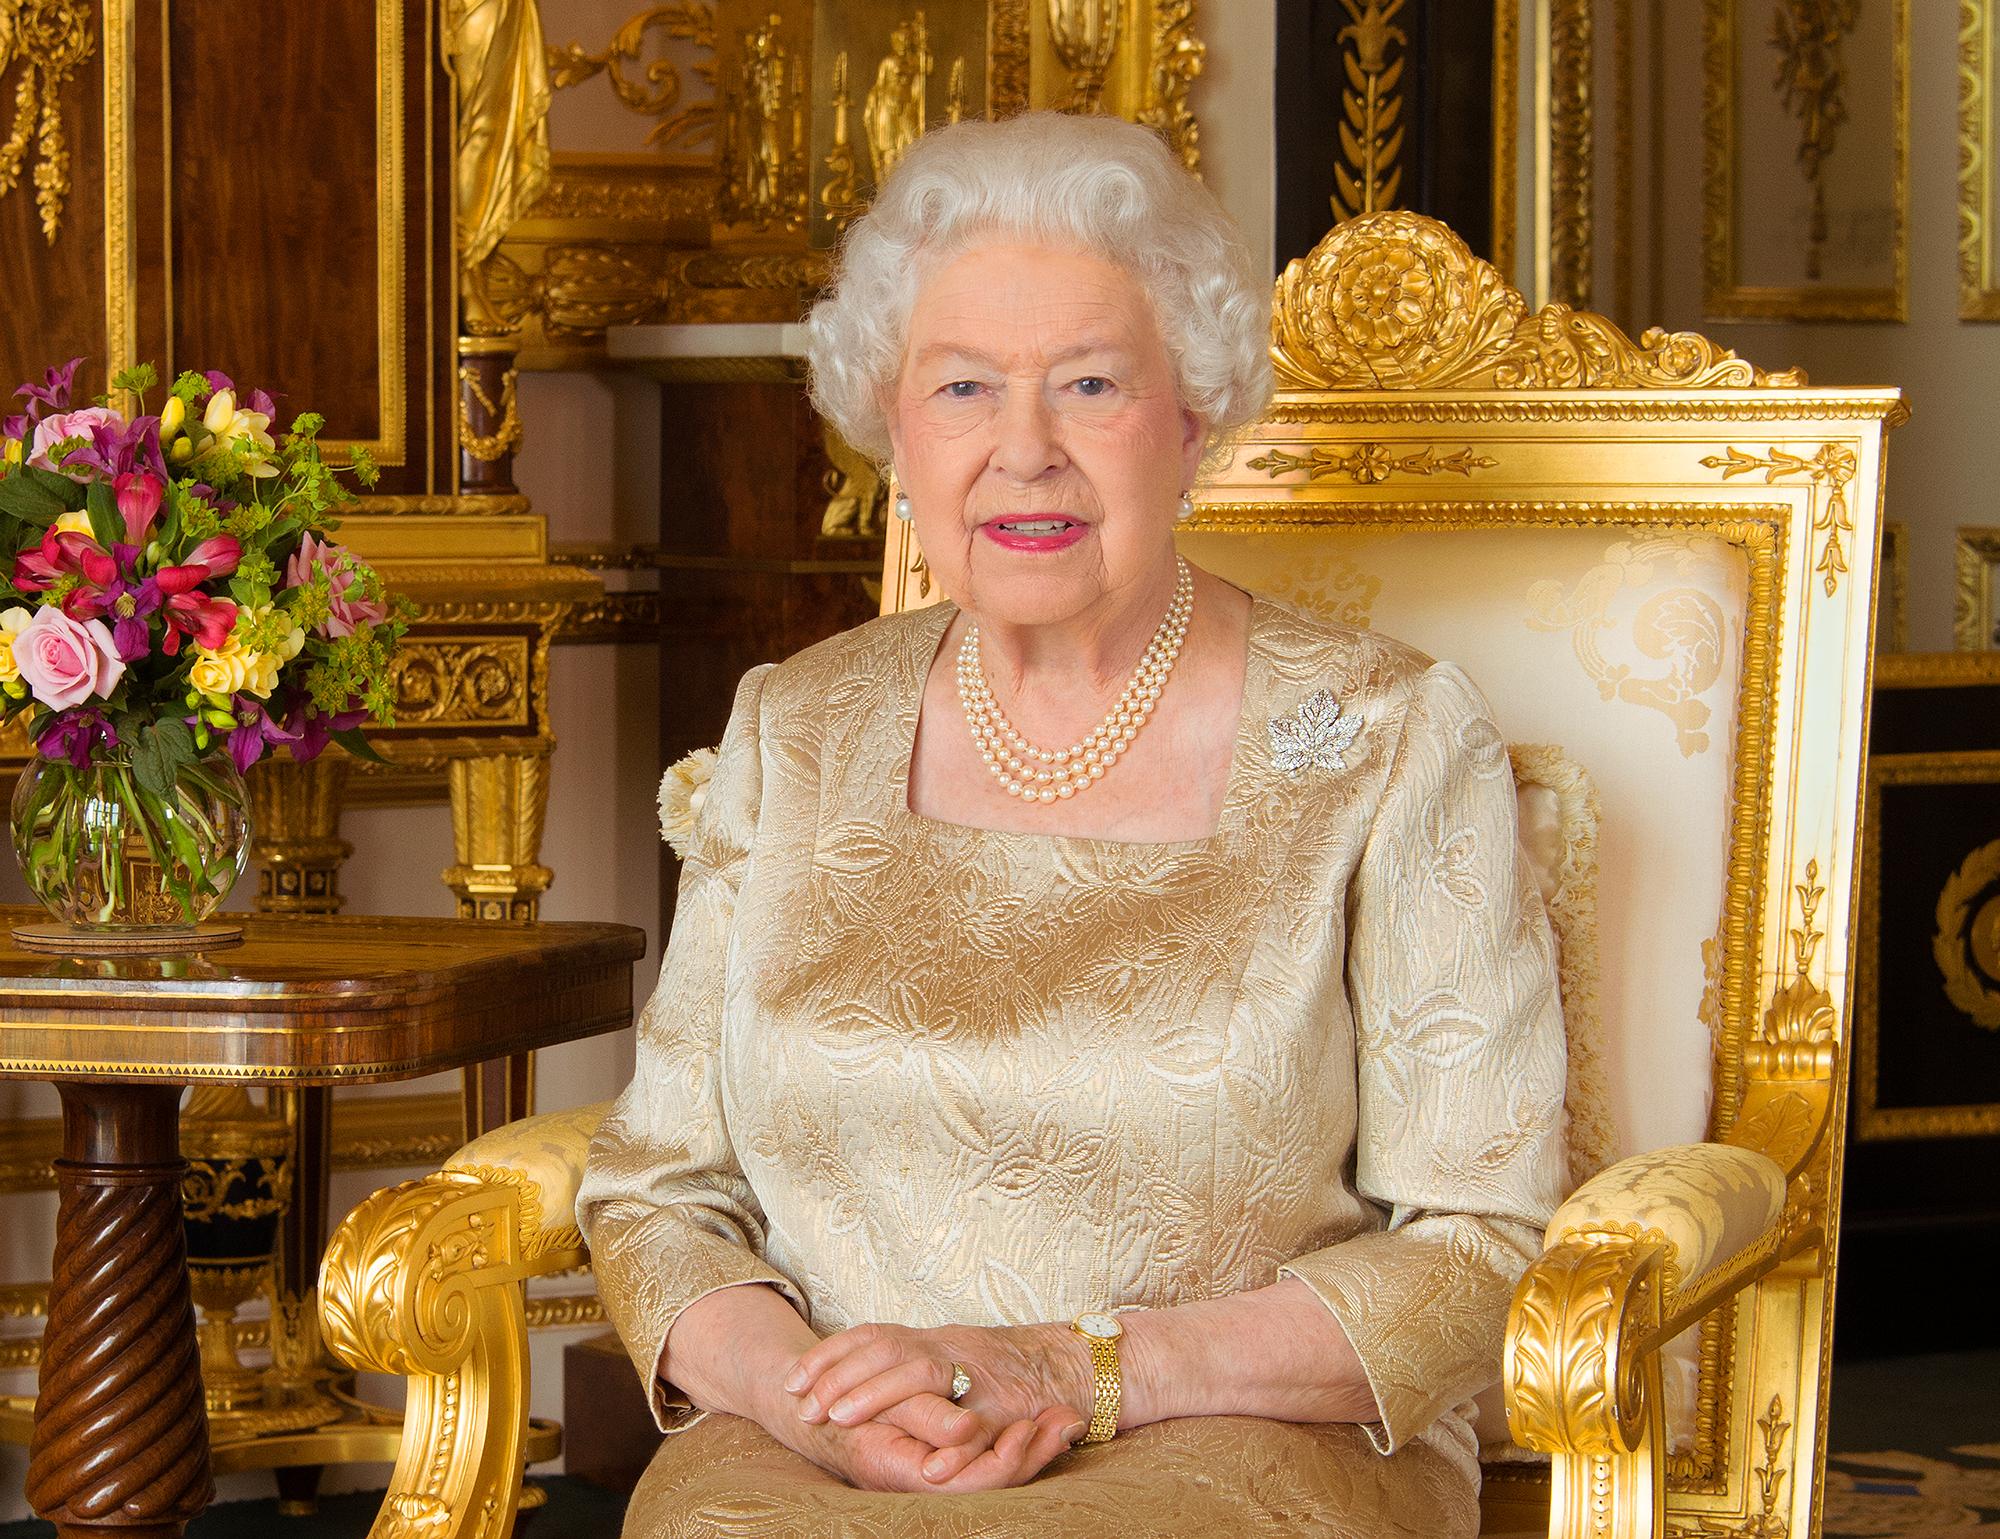 Картинка королевы елизаветы